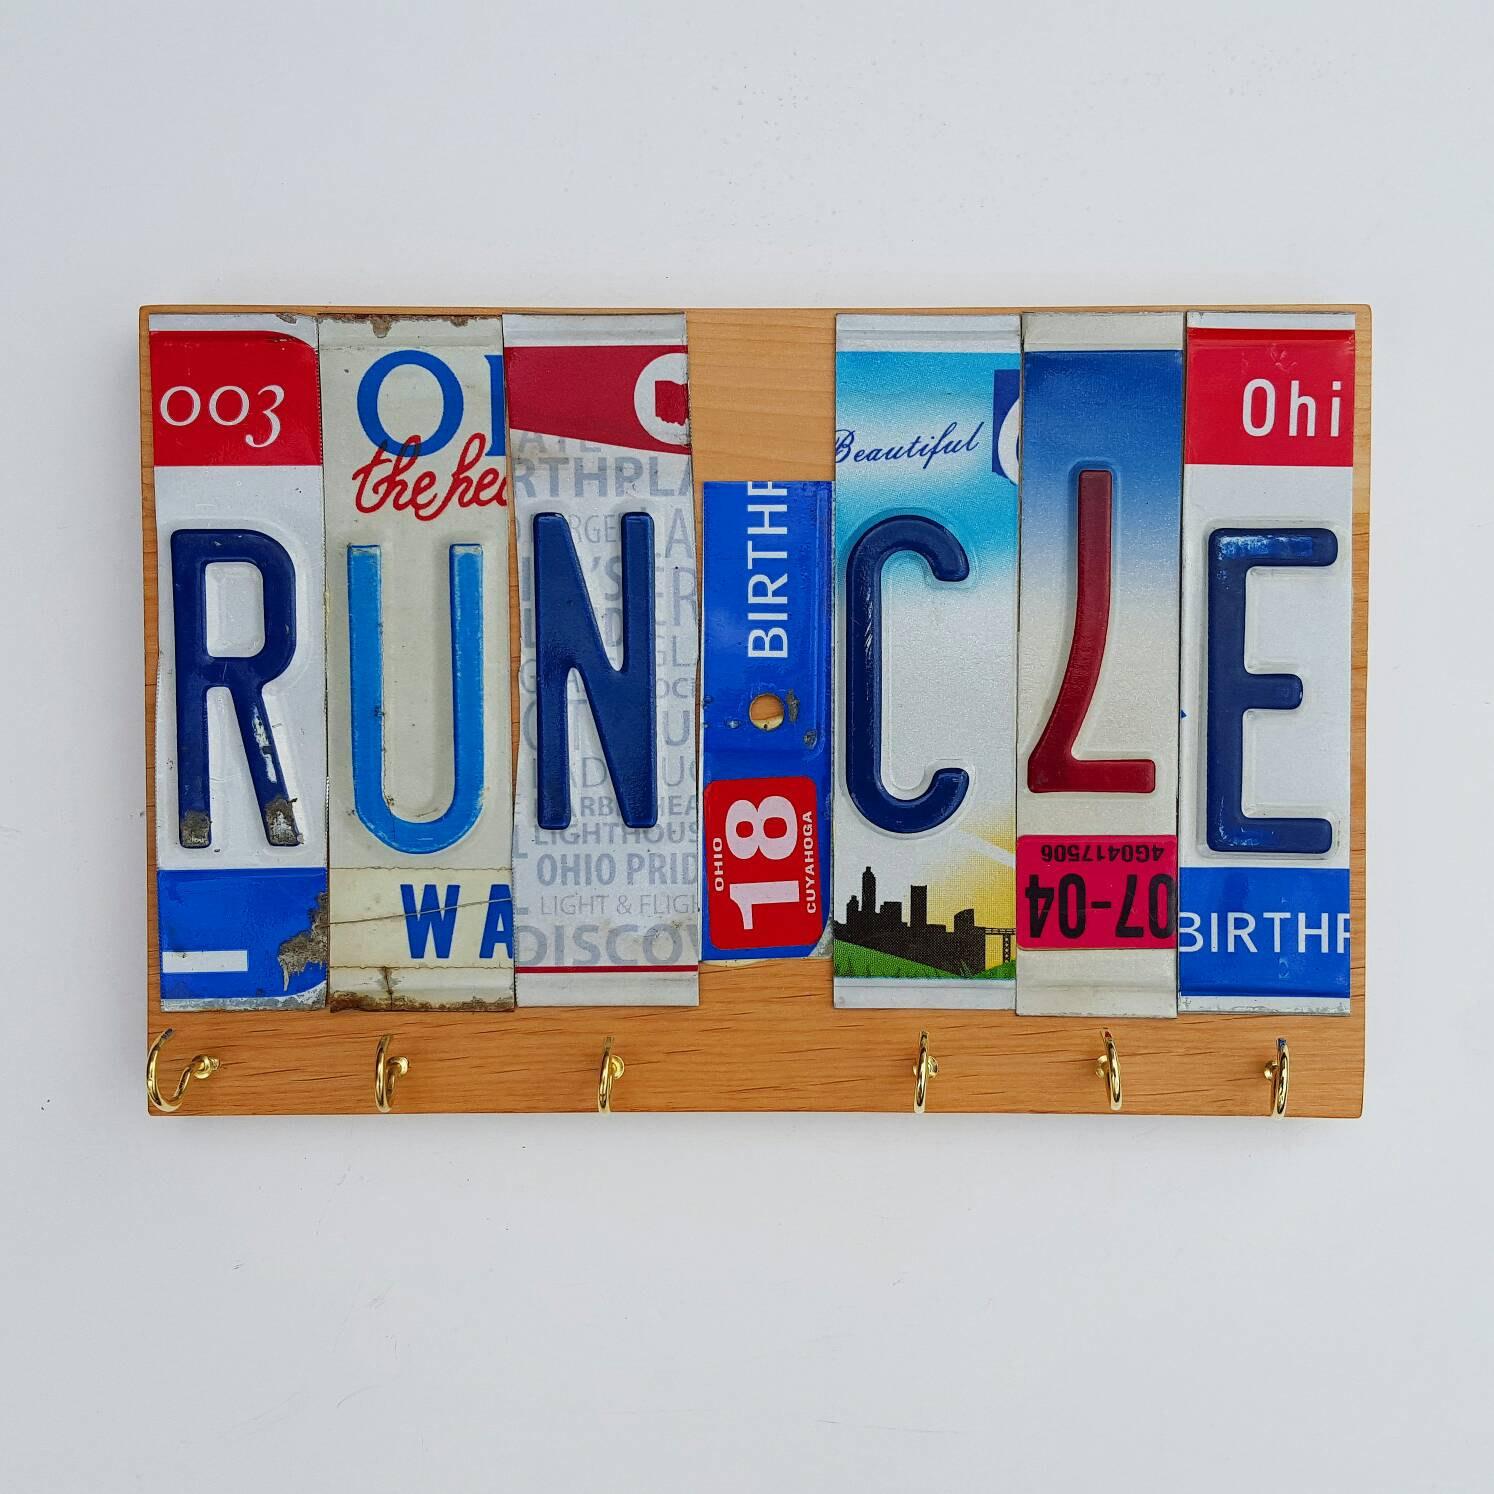 Run Cle Race Medal Display License Plate Solid Wood Display Race Medal Holder Marathon Medal Hanger License Plate Letters Runners Gift Sold By Unlimitedstride On Storenvy